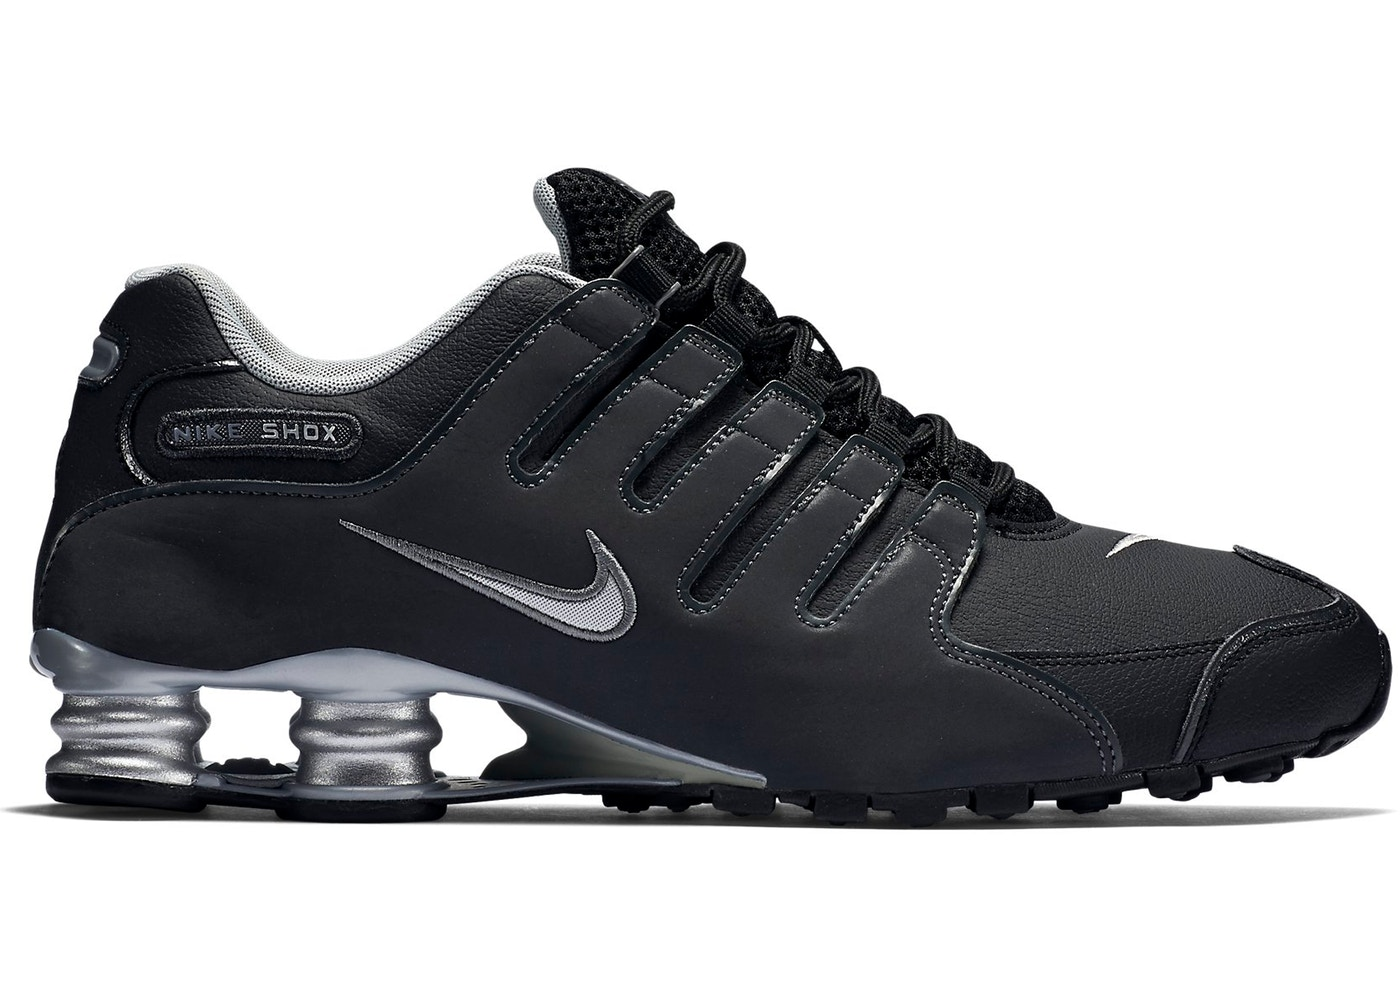 dd3e4e704bb Sell. or Ask. Size  13. View All Bids. Nike Shox NZ Black Silver